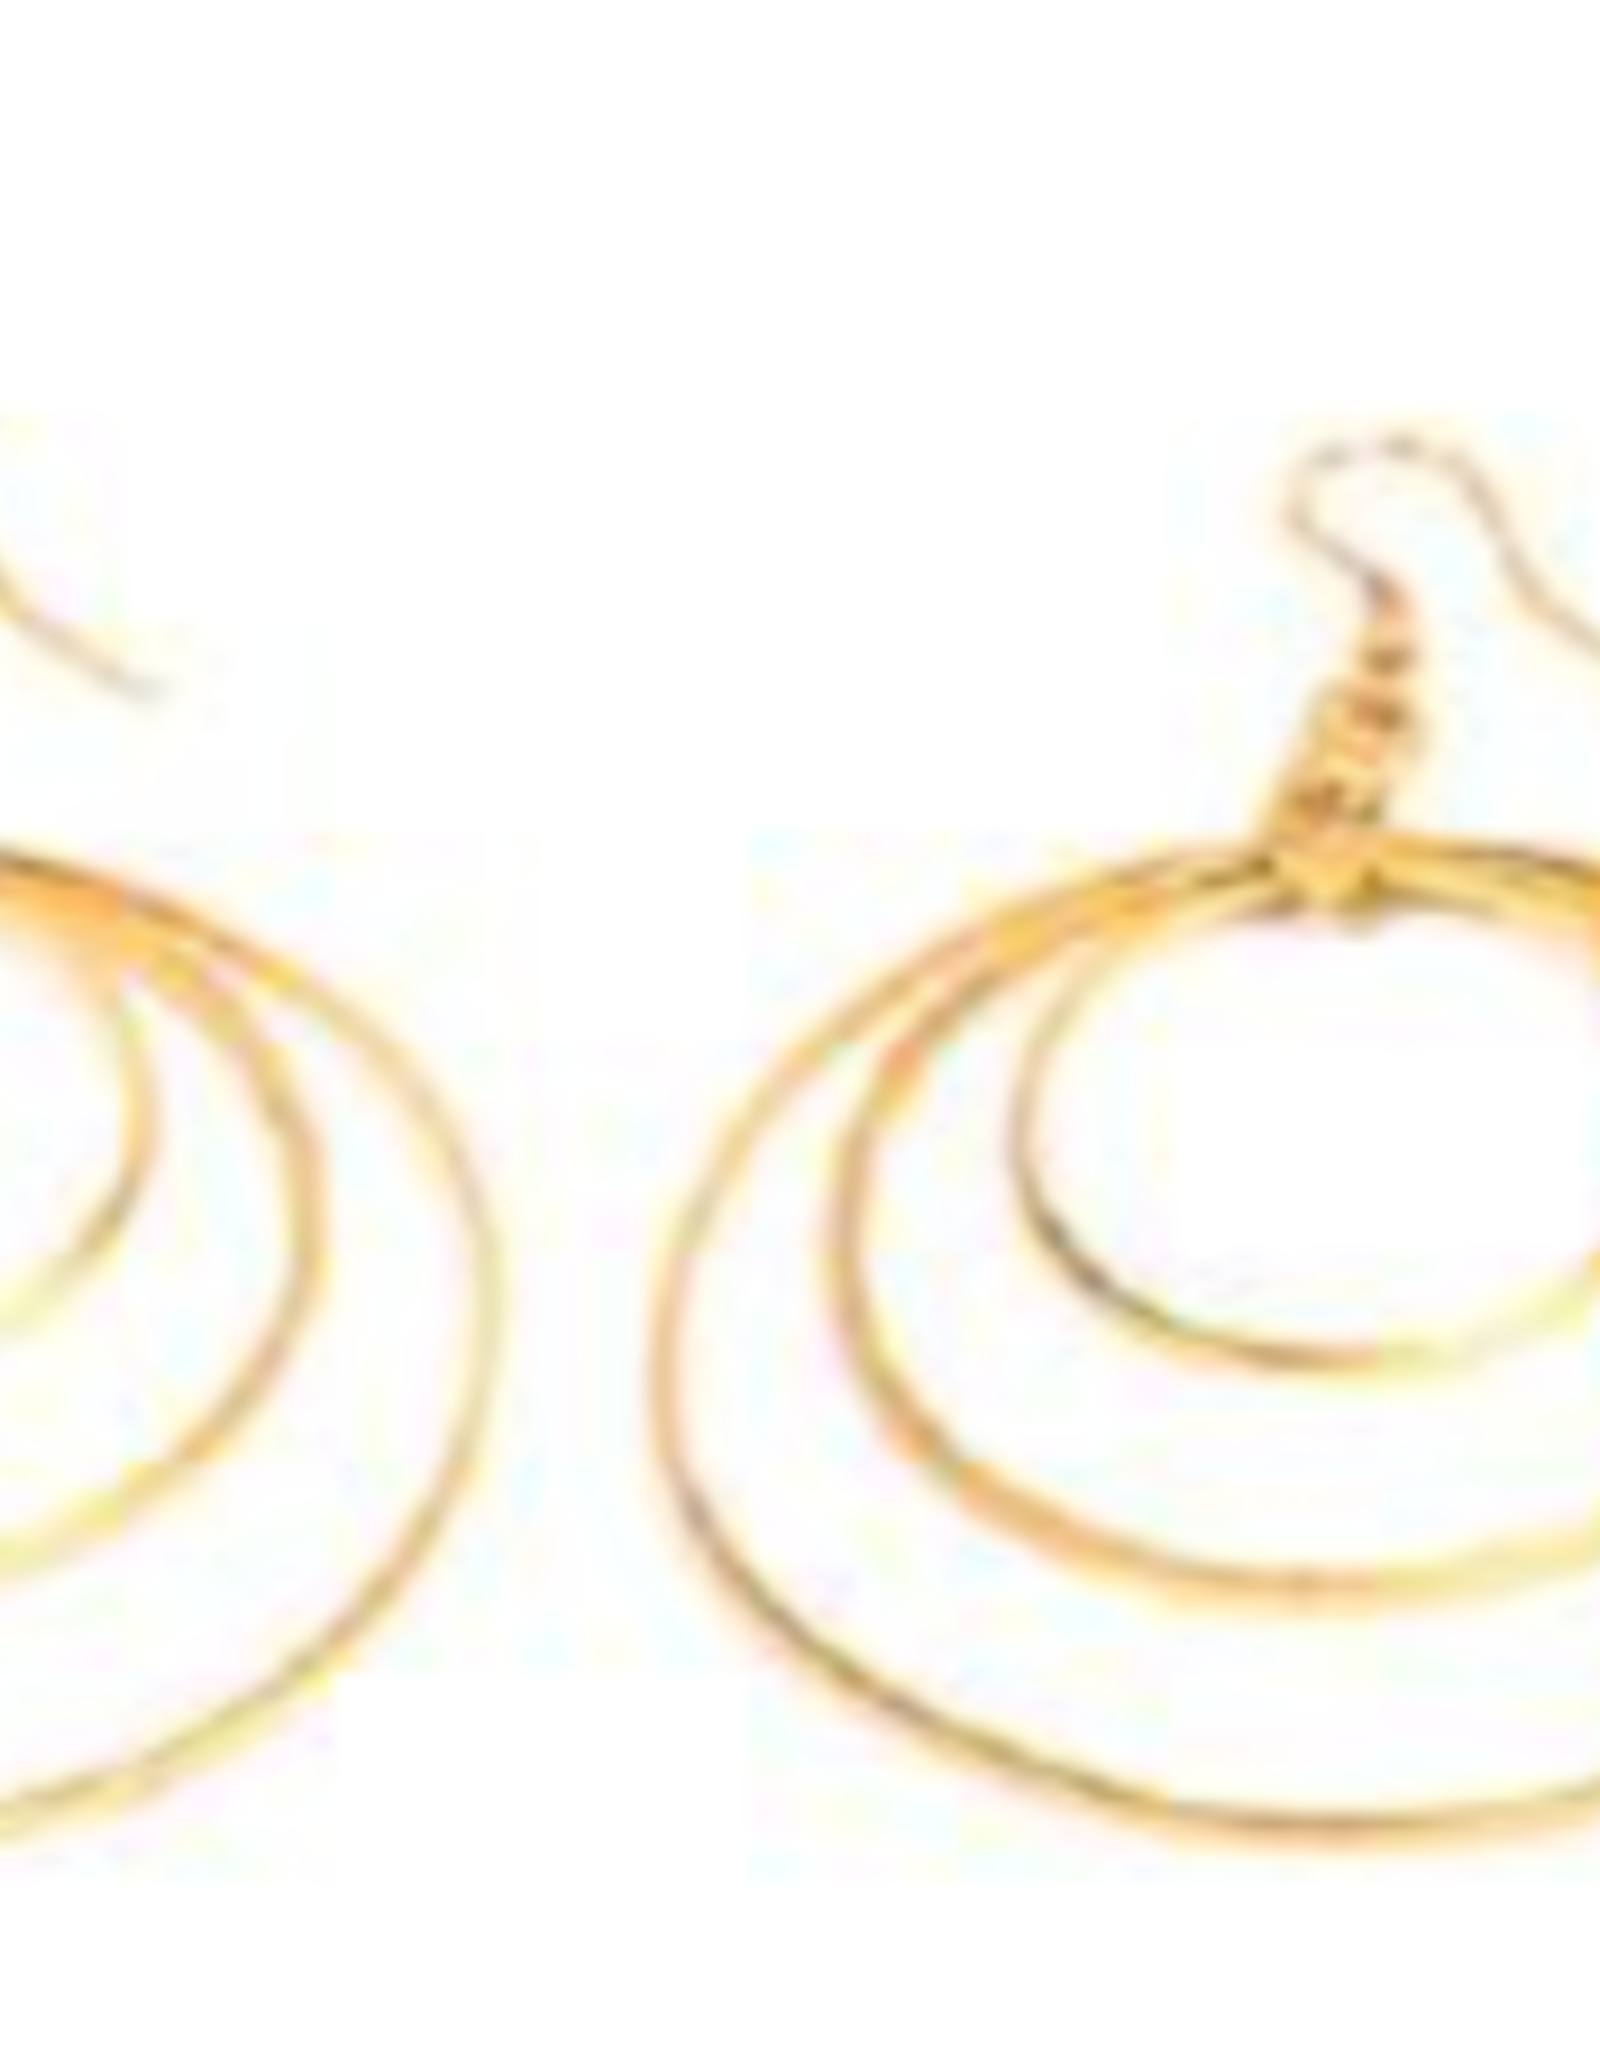 VESTOPAZZO Brass 3 Round Earring